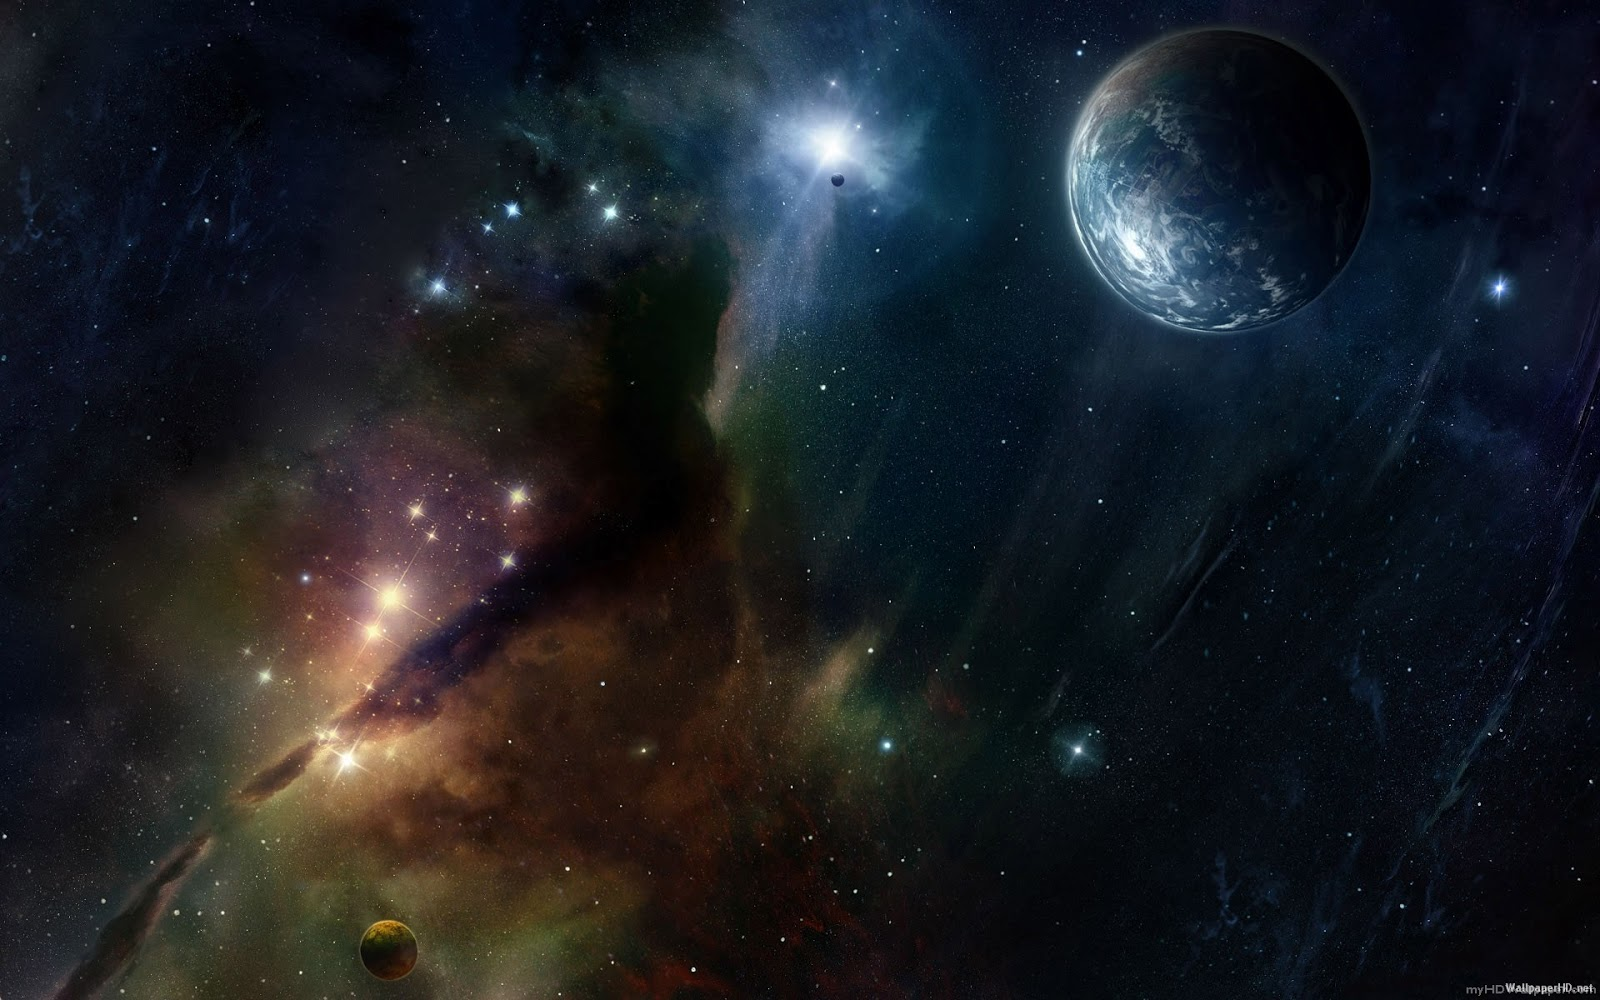 hd planet wallpapers hd wallpaper planet wallpaper hd planets hd 1600x1000